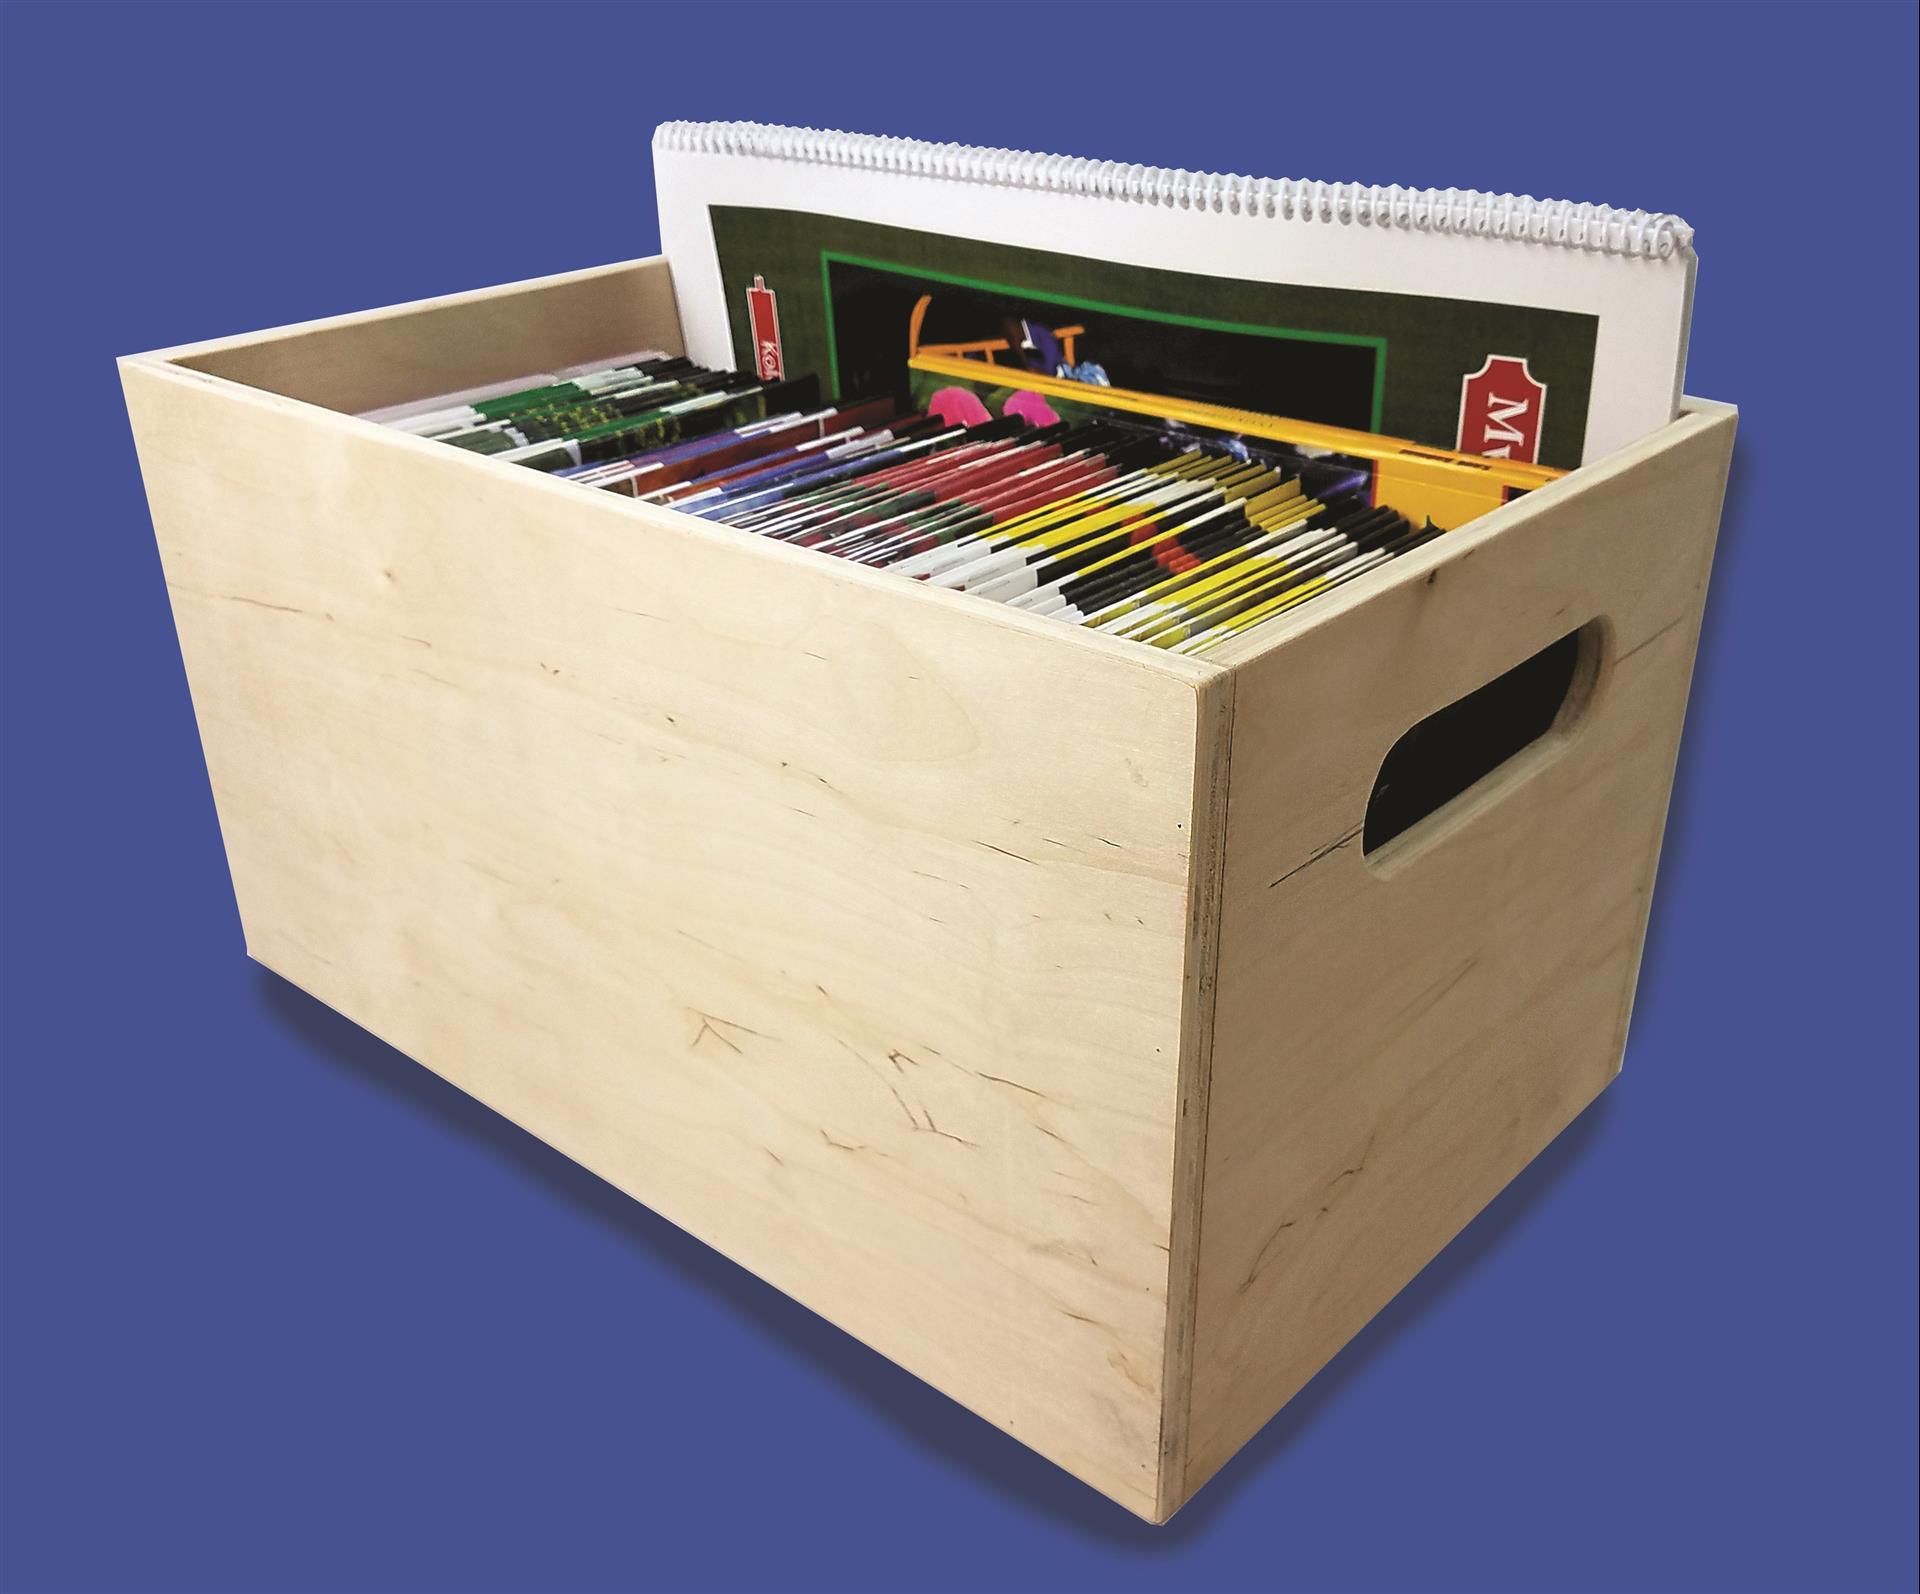 Portable Library for K-5 / Bibliyotèk mobil K-5